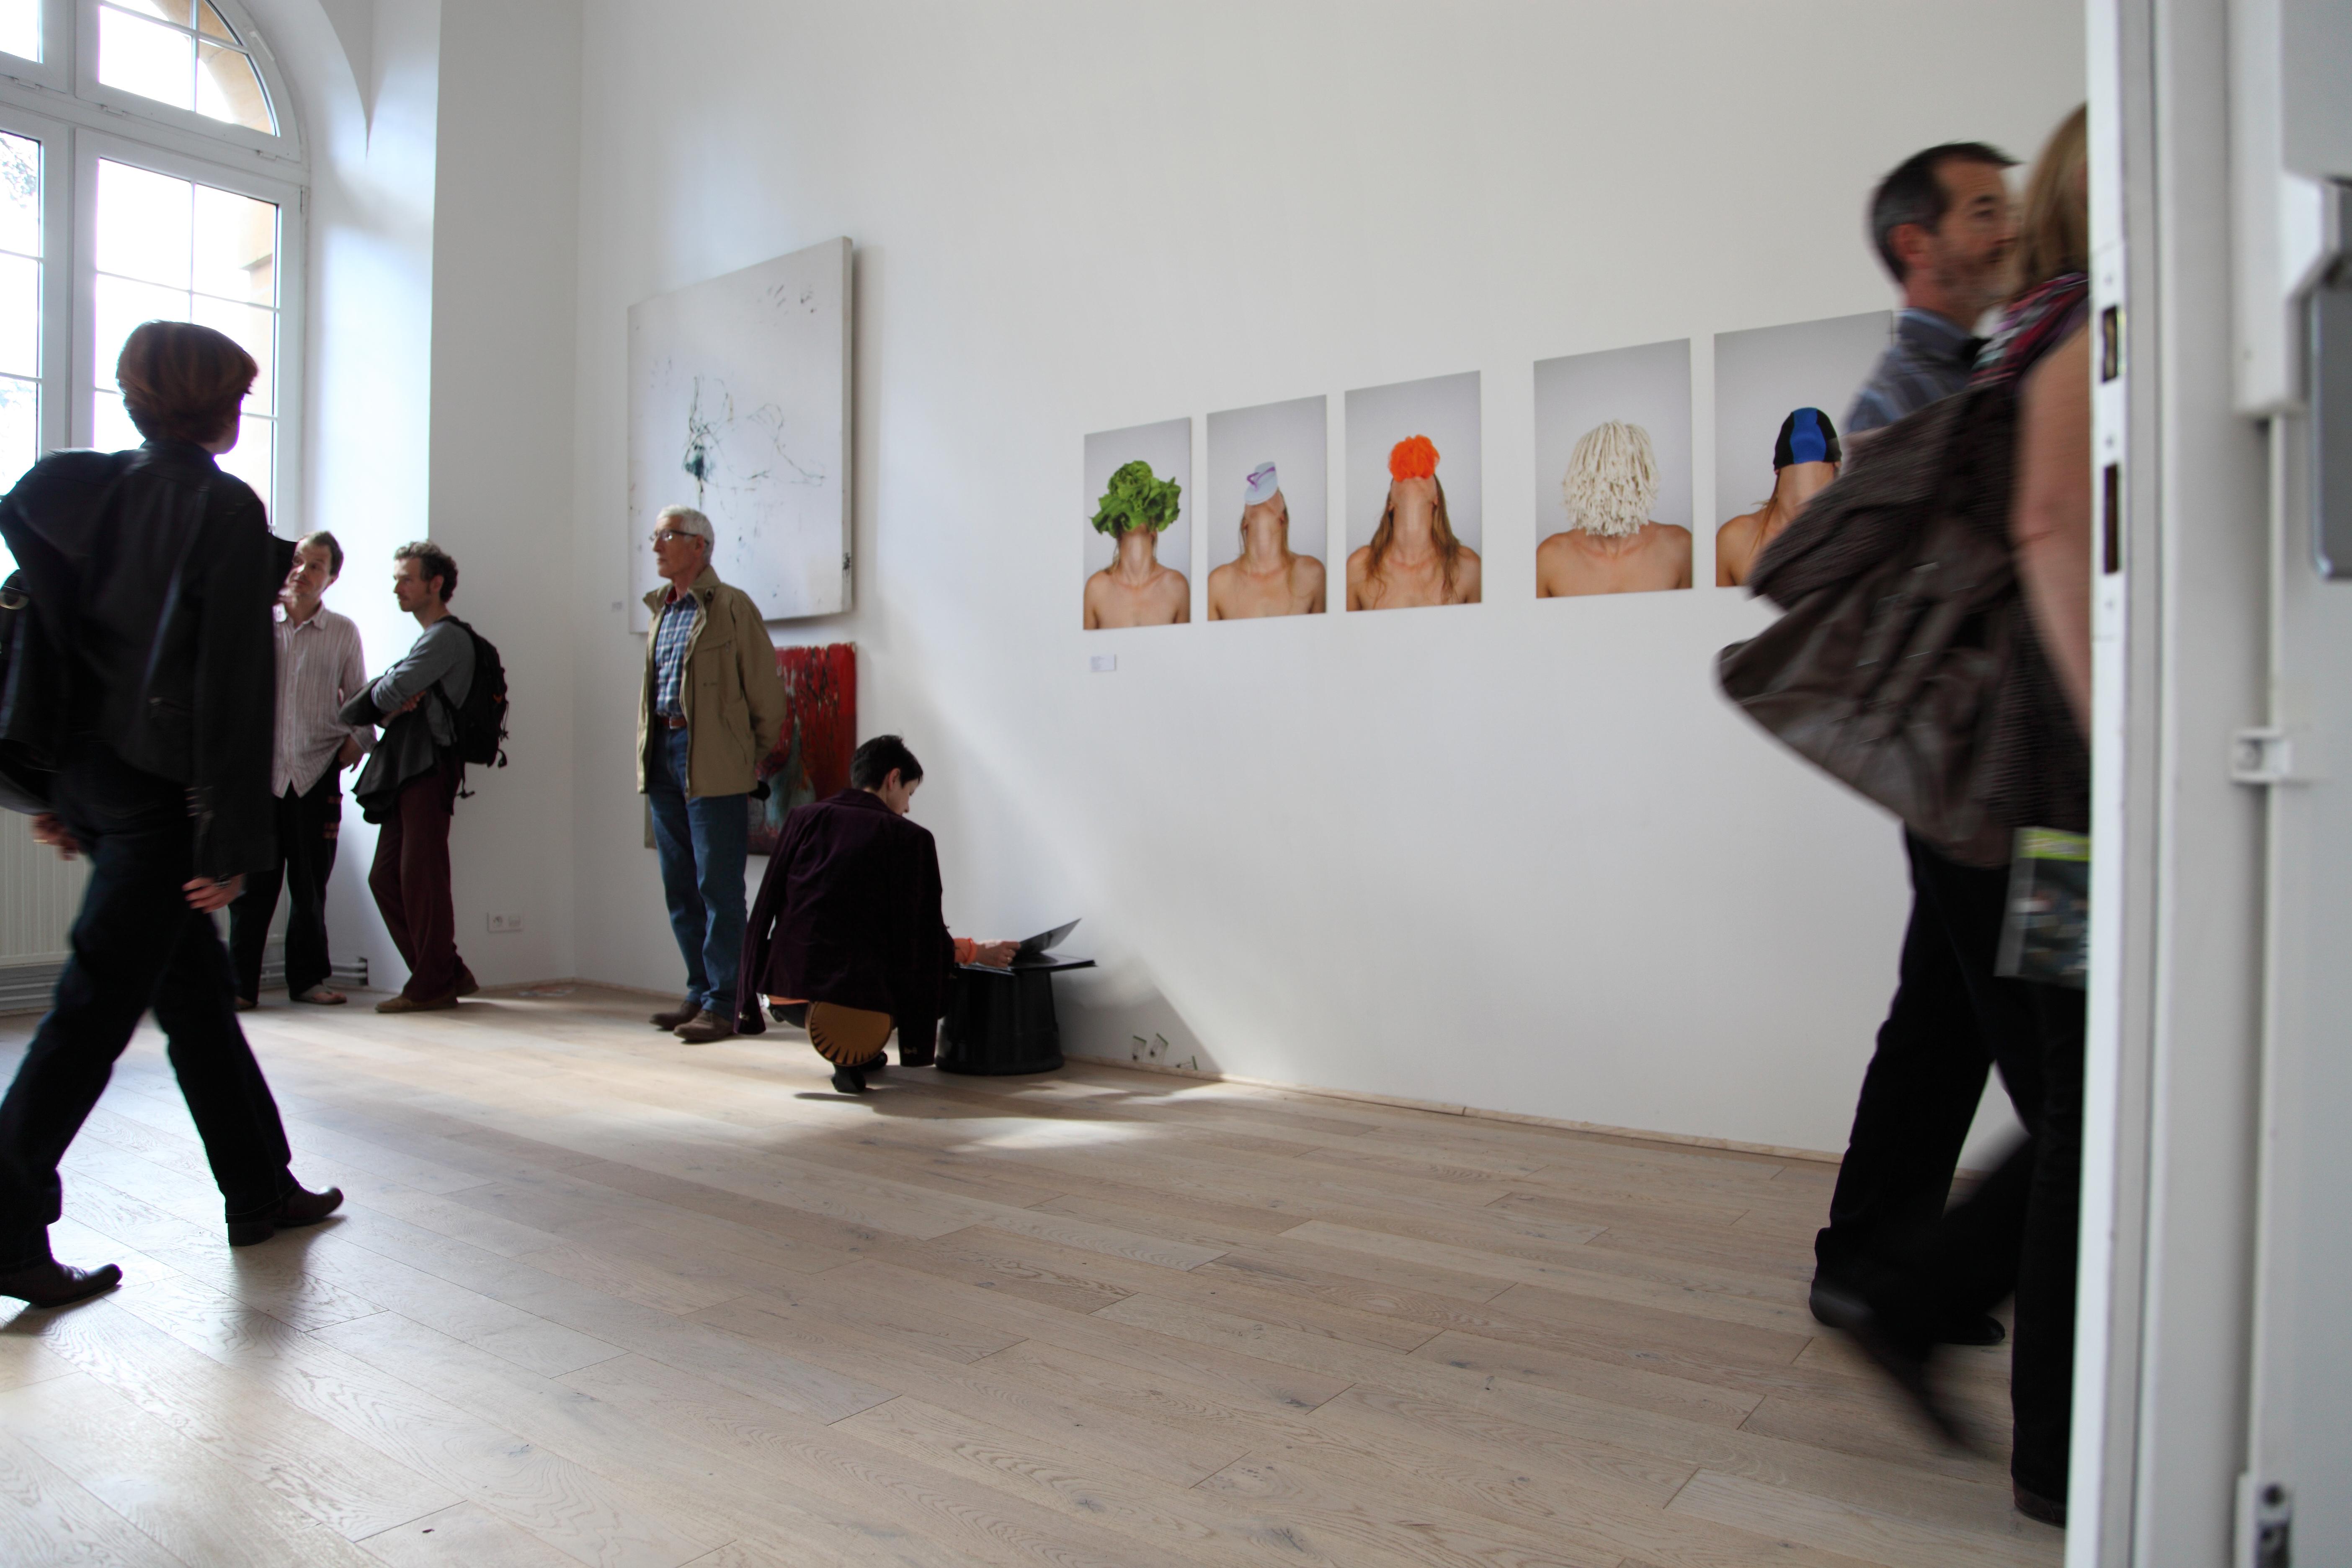 parcours-d-artistes-metz-2012